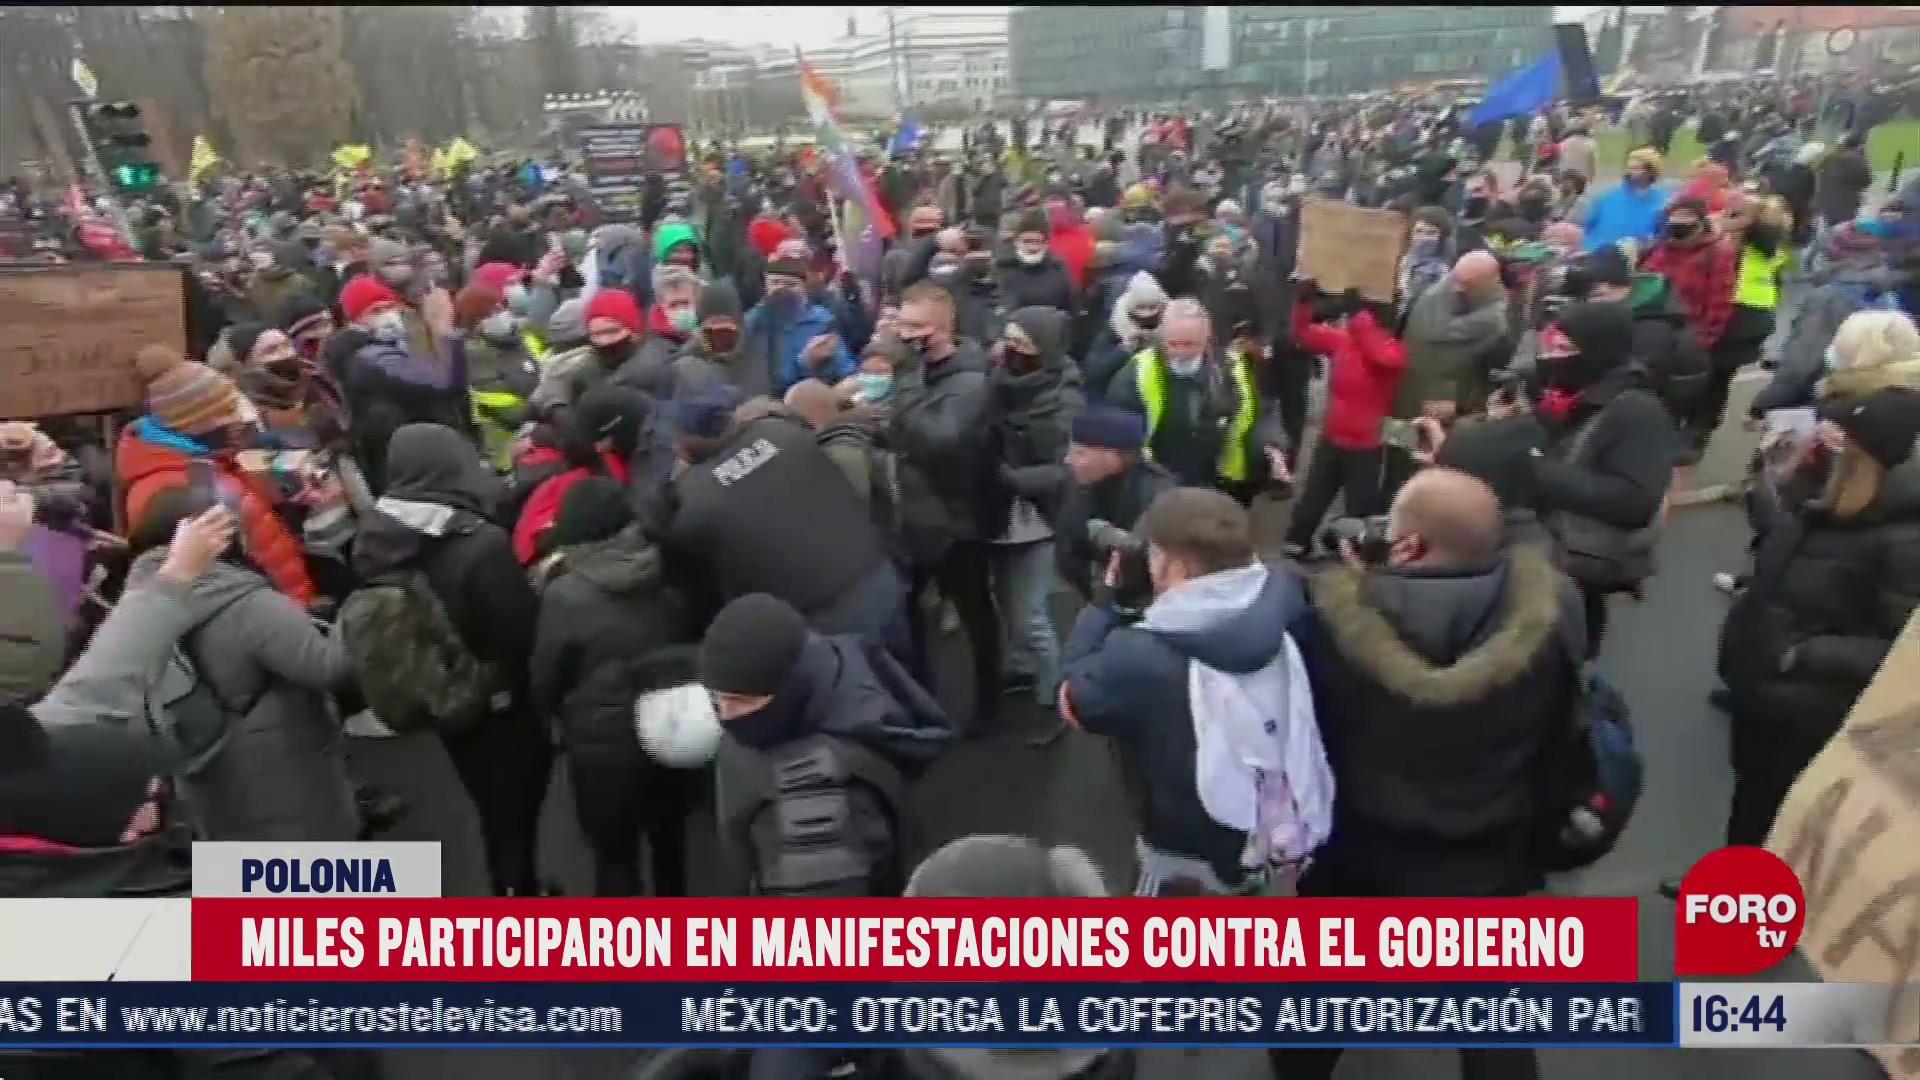 polonia vive jornada de protestas politicas